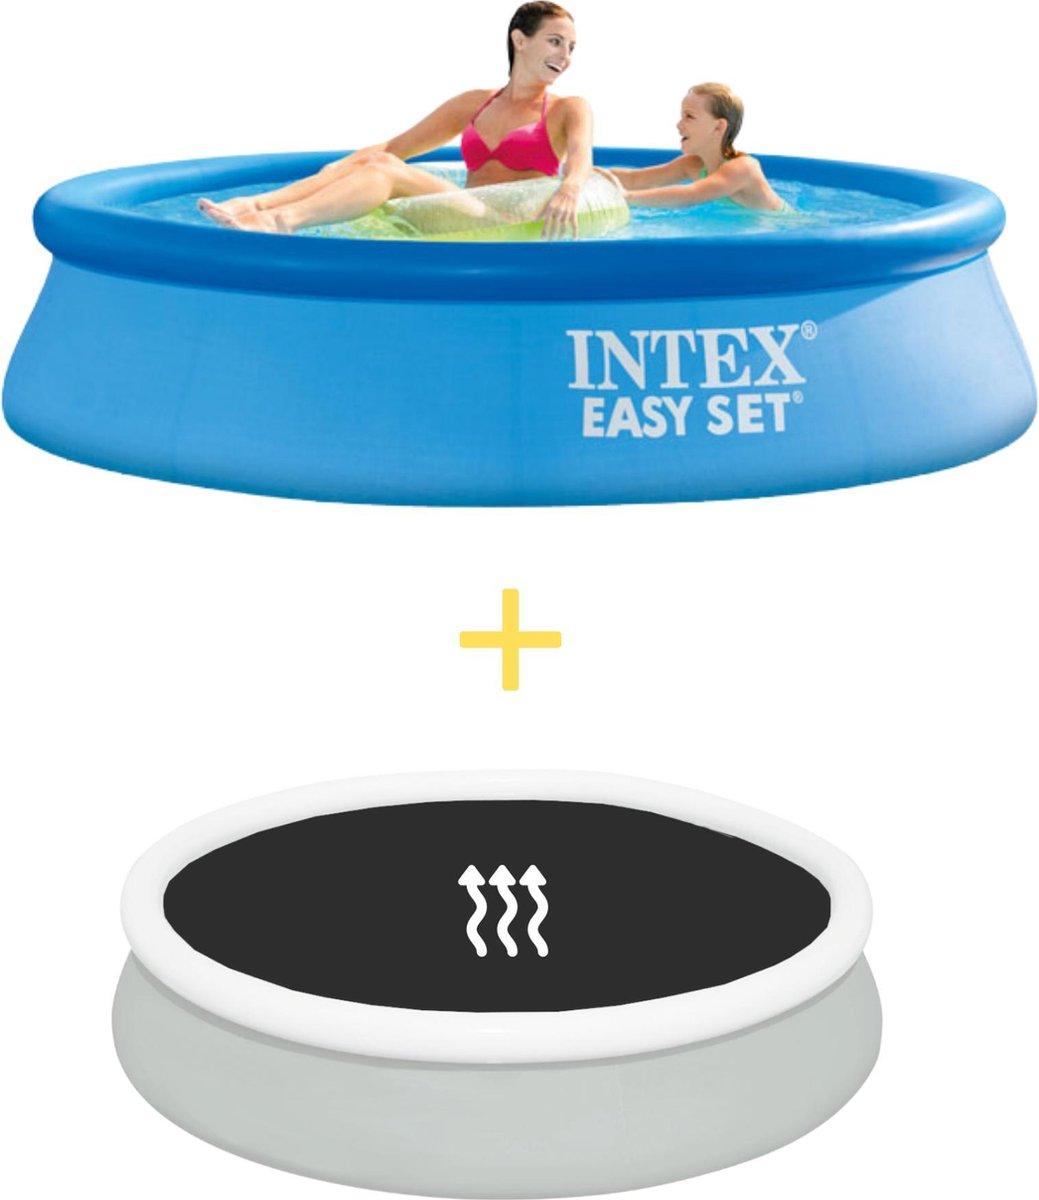 Intex Zwembad - Easy Set - 244 x 61 cm - Inclusief Solarzeil